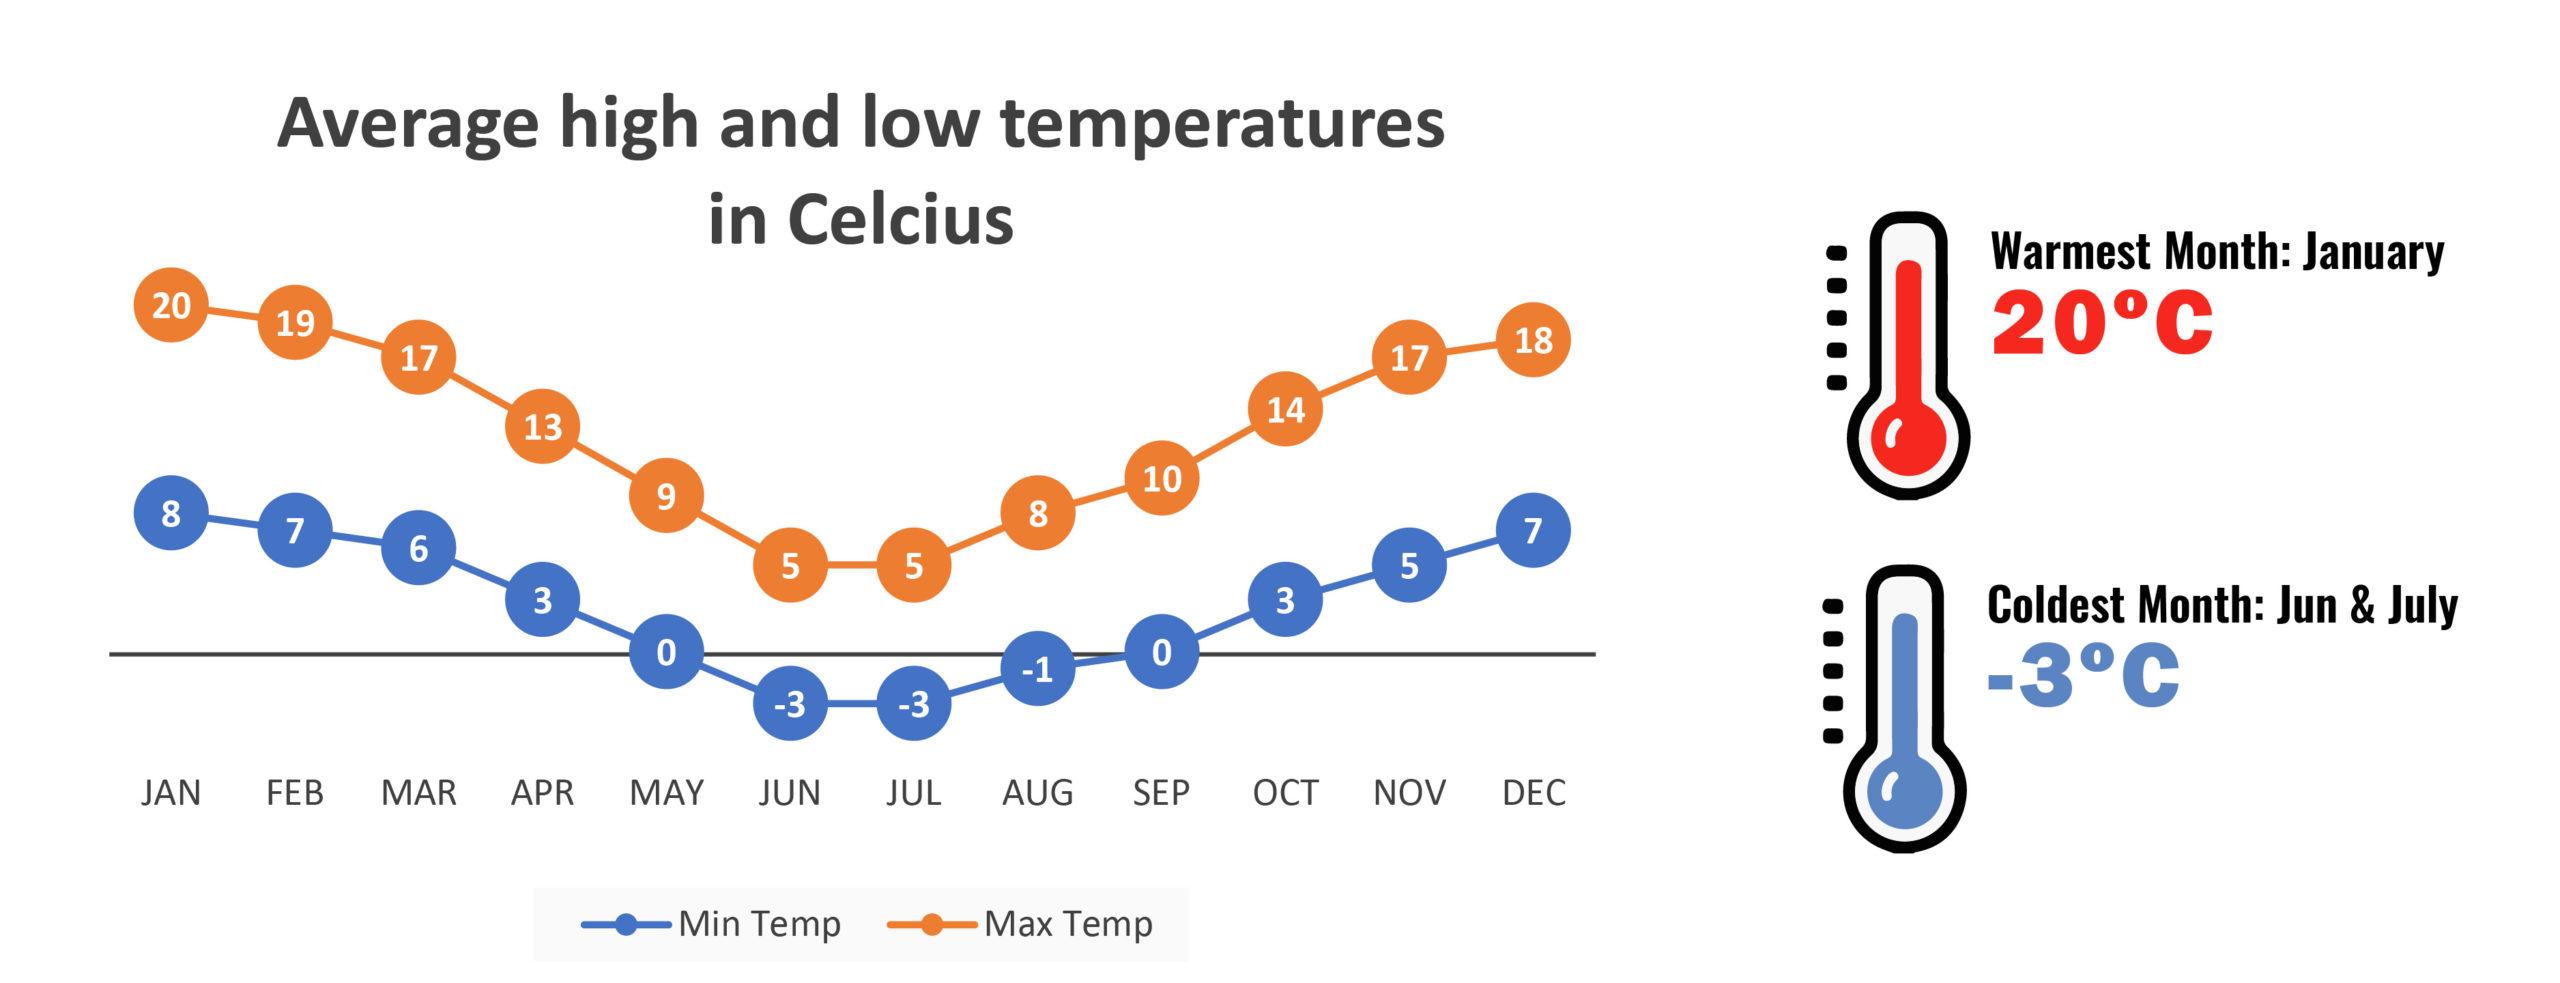 Temperatures in Puerto Natales - Weather in Puerto Natales and Torres del Paine area - RipioTurismo DMC for Chile